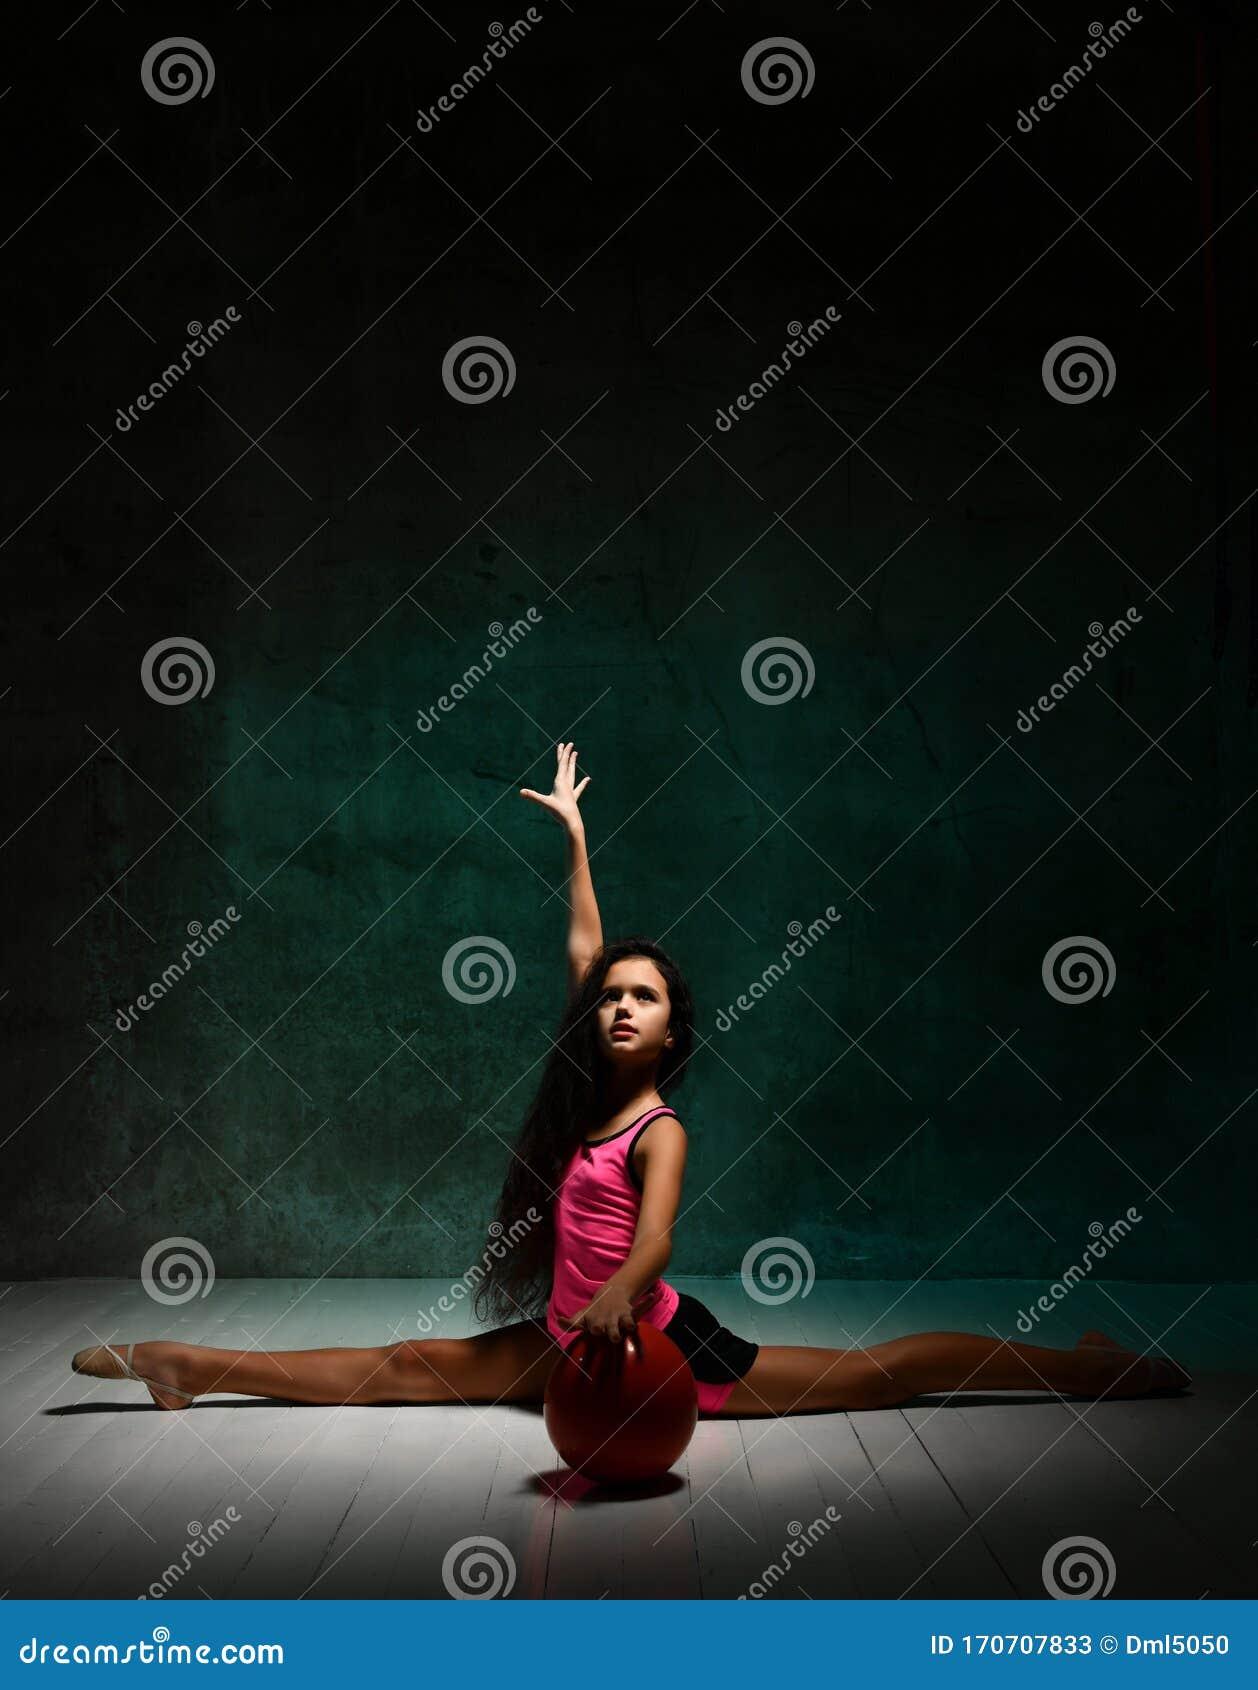 Rhythmic gymnastics stock image. Image of jumping, gymnist